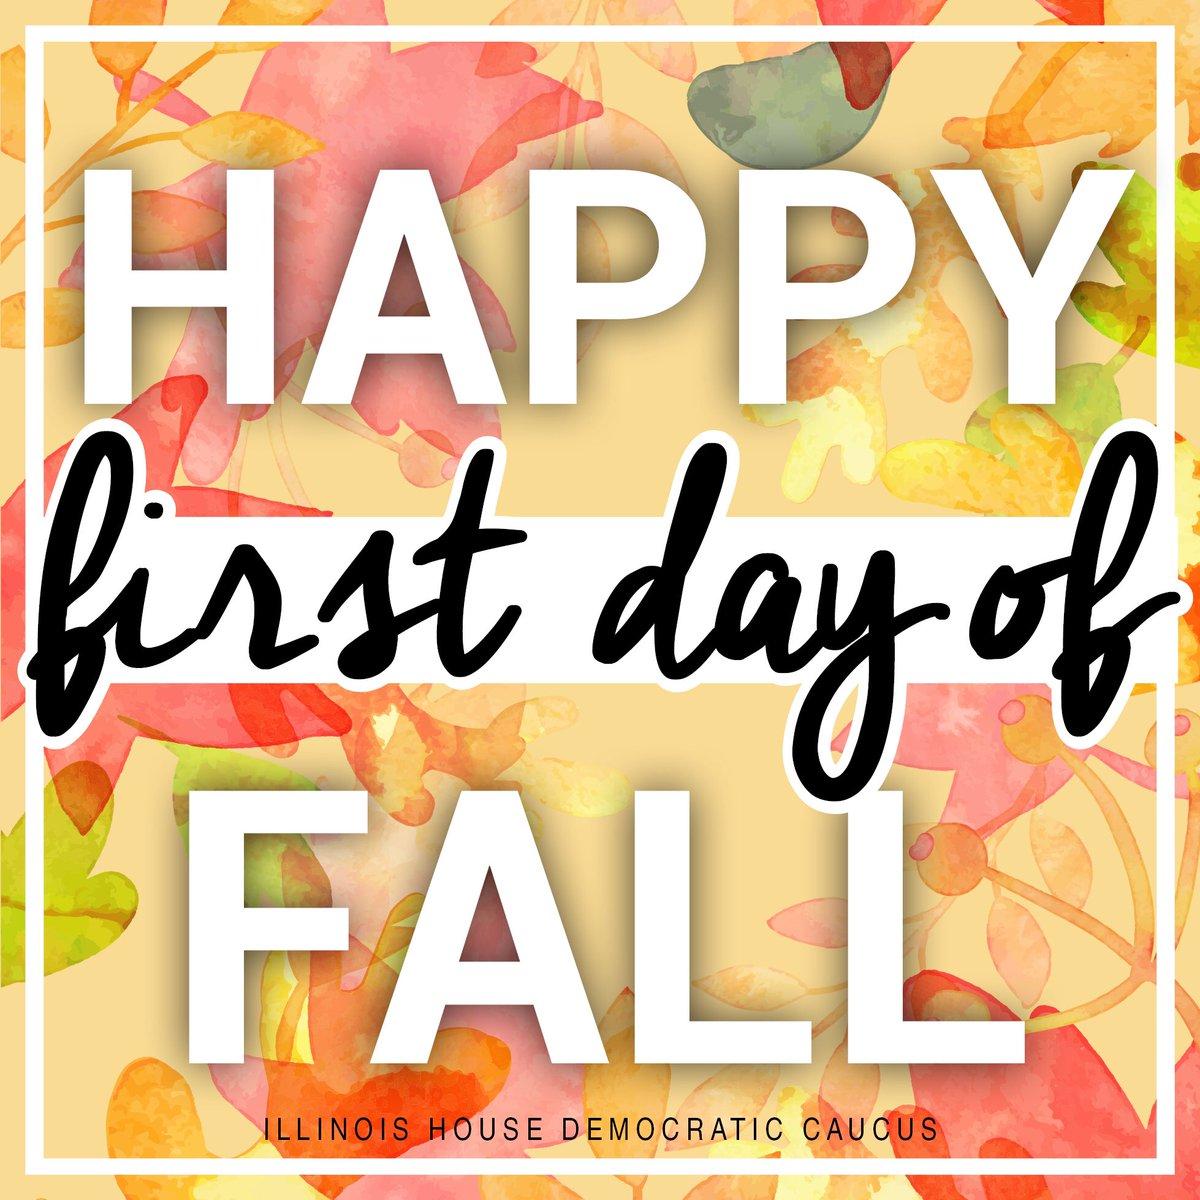 test Twitter Media - Happy First Day of Fall! Enjoy the Summer weather! https://t.co/bKLLvBAxLM